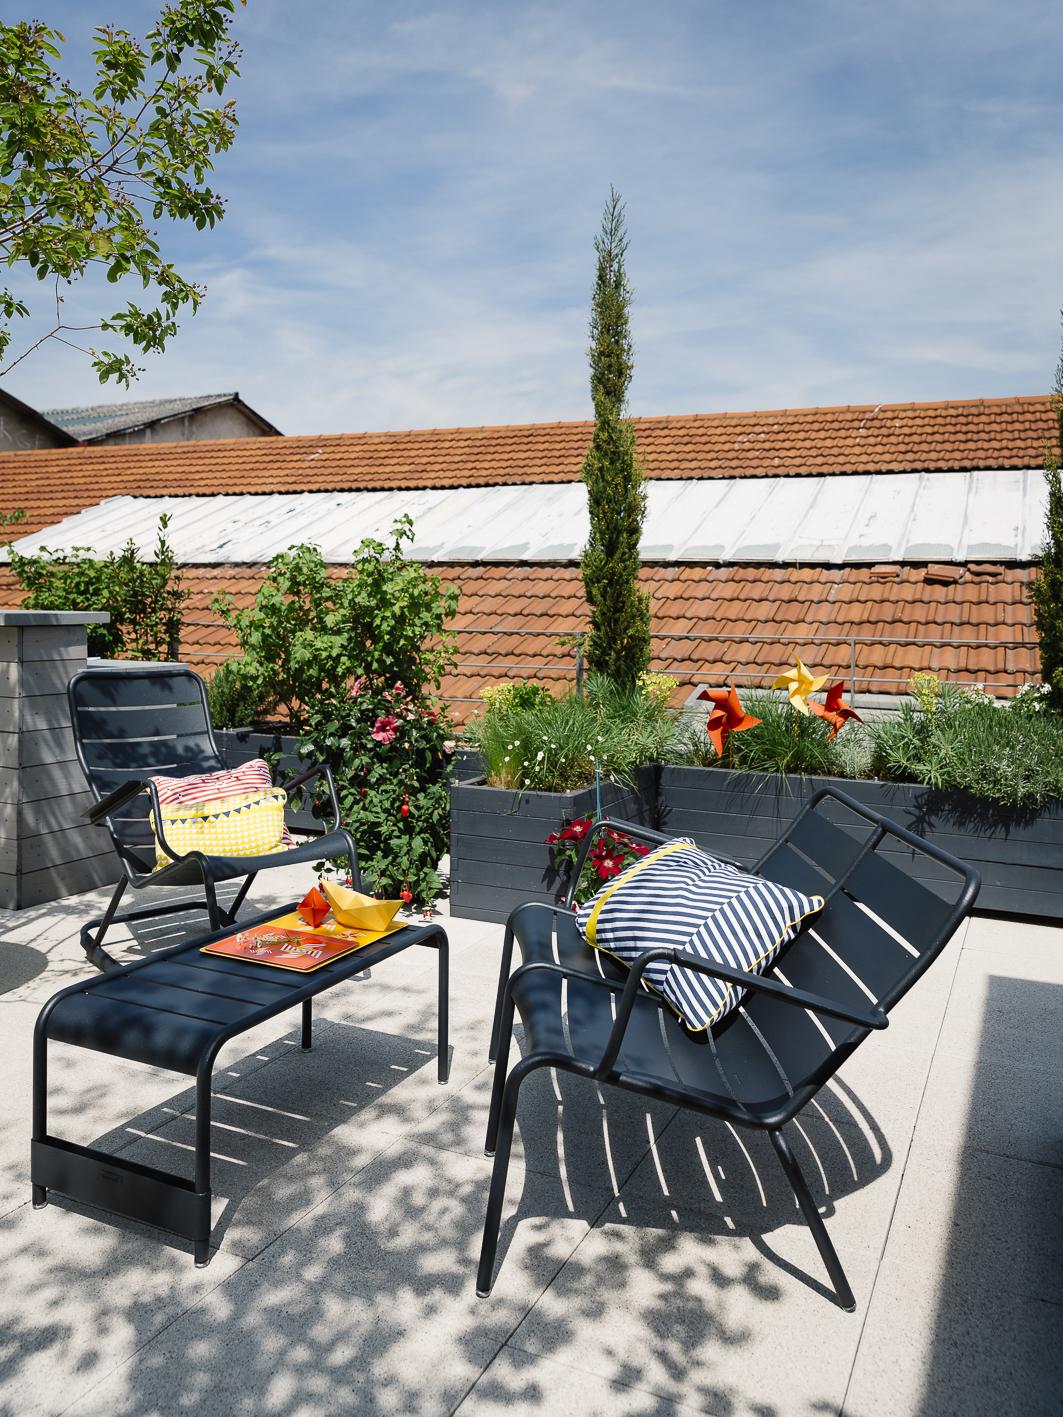 Salon de jardin metal fermob - Mailleraye.fr jardin